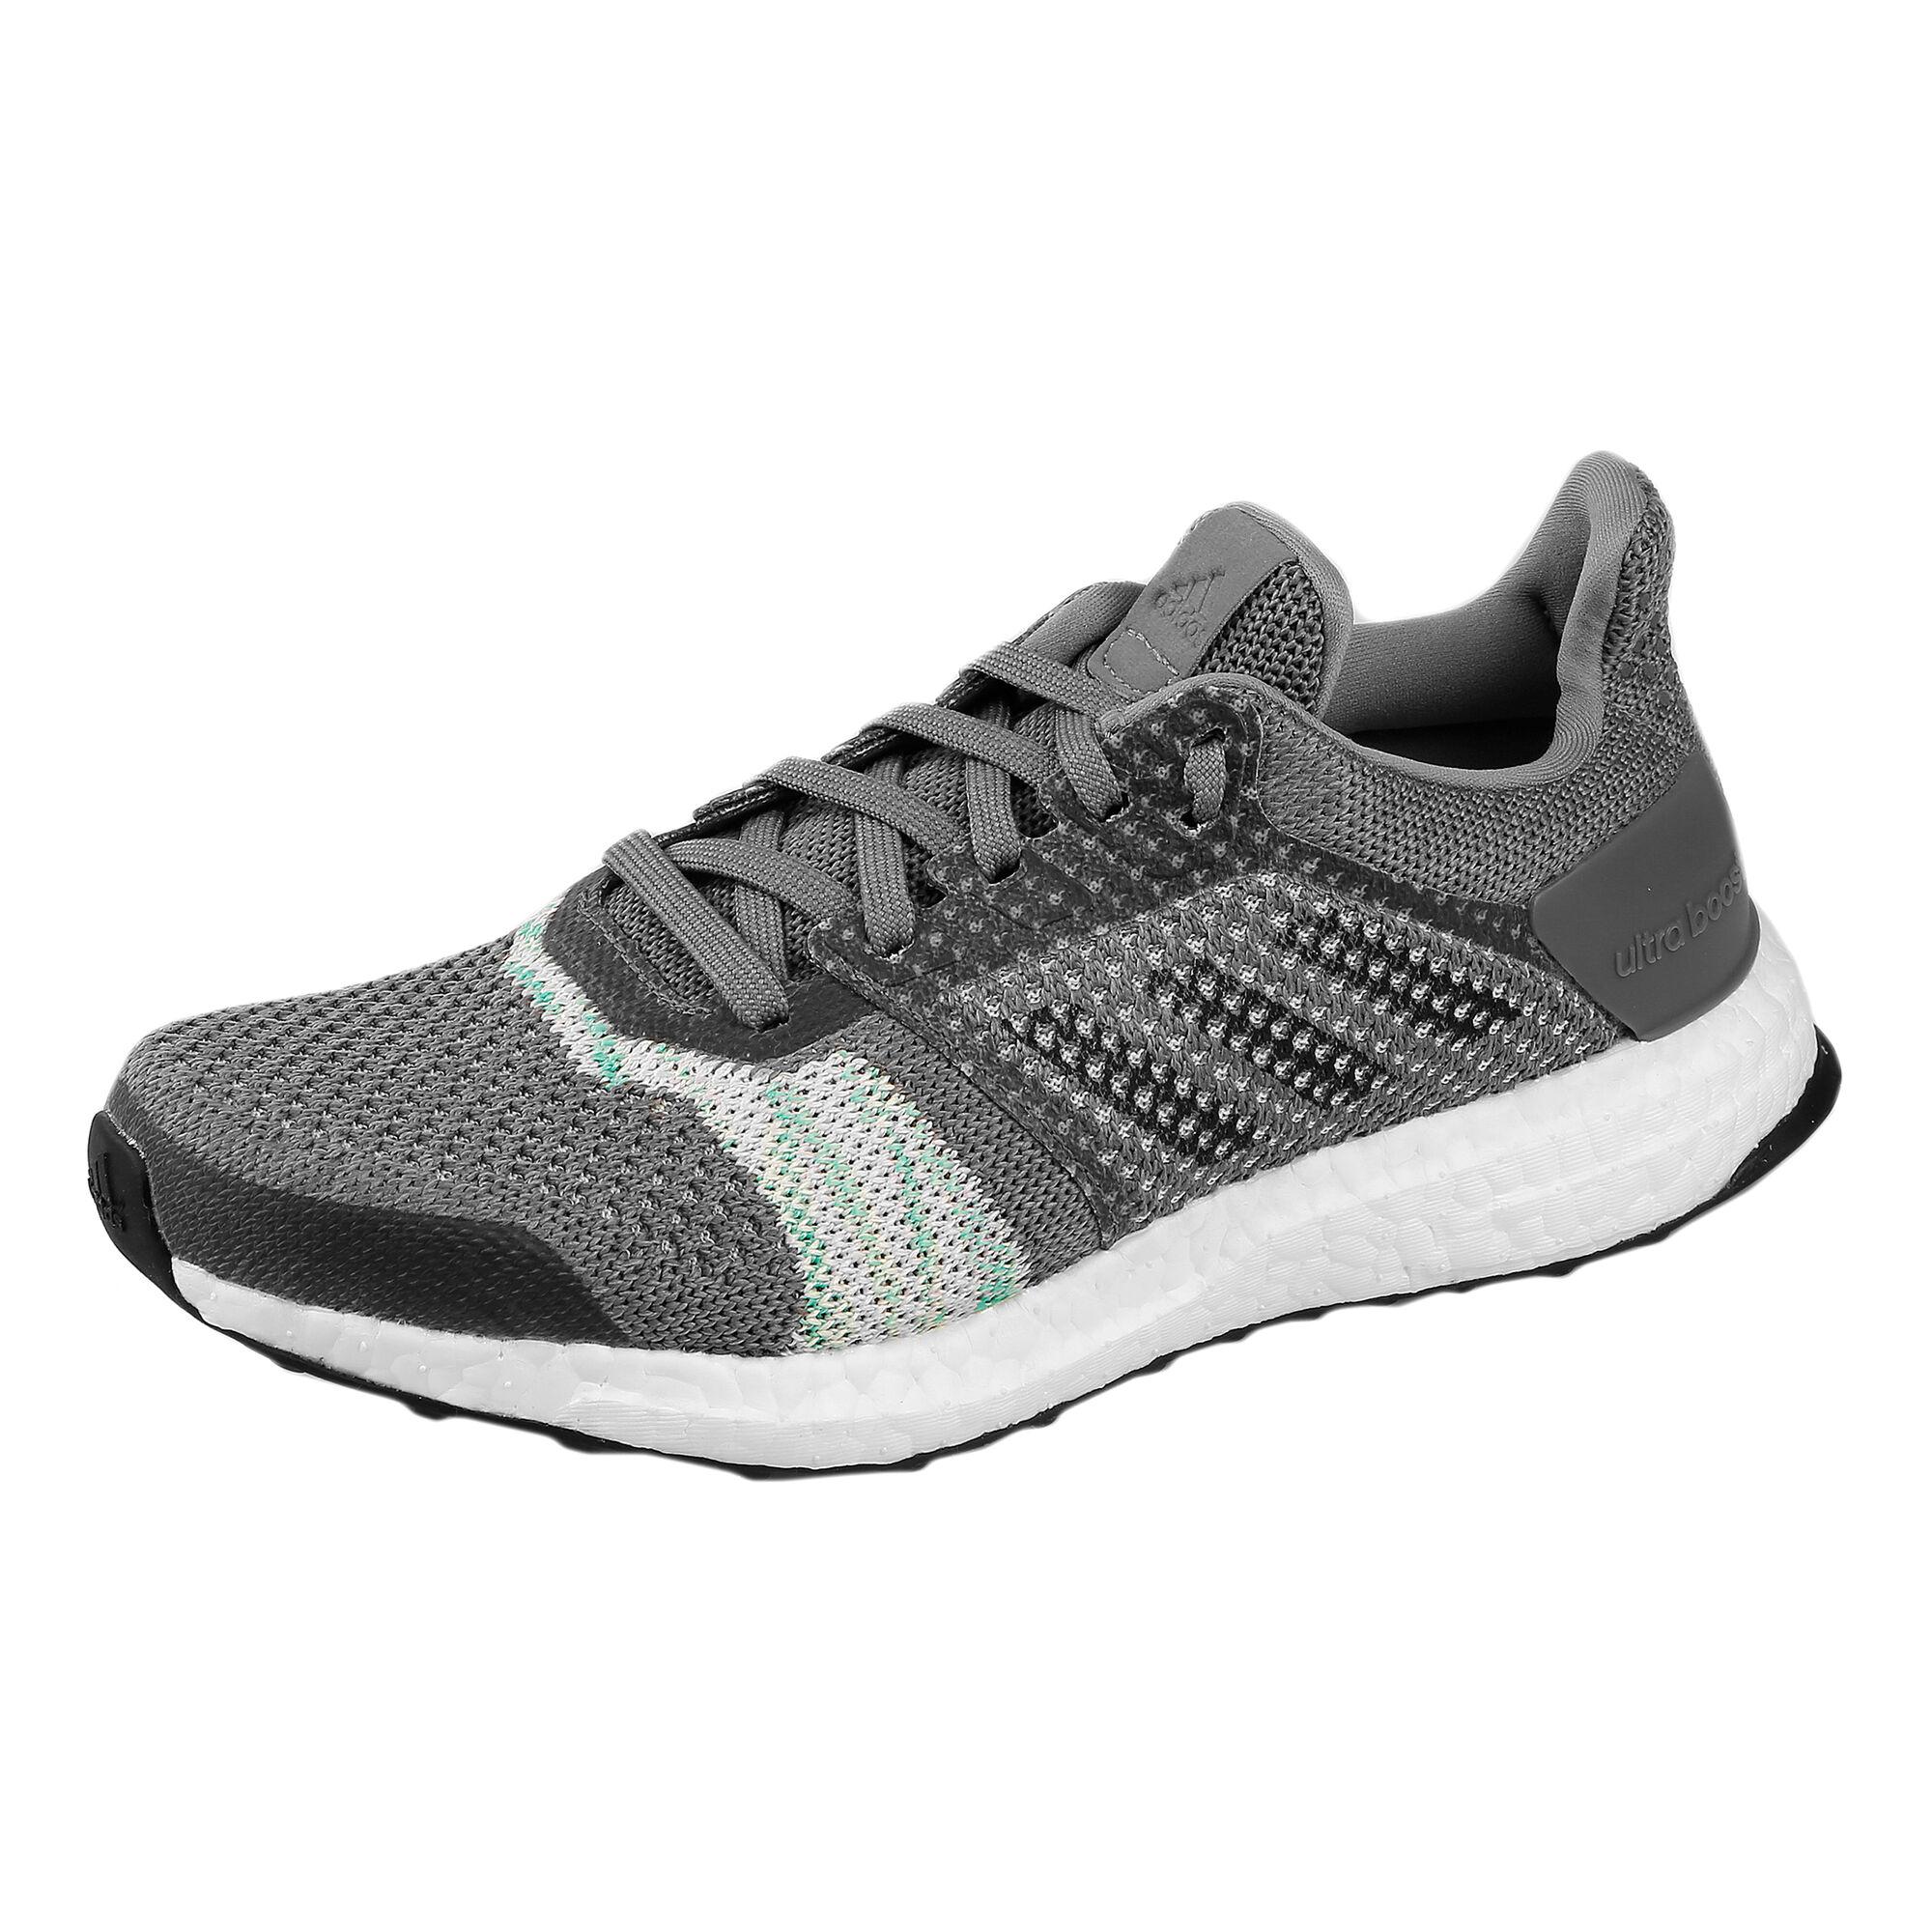 483c3a09d buy adidas Ultra Boost ST Stability Running Shoe Women - Dark Grey ...